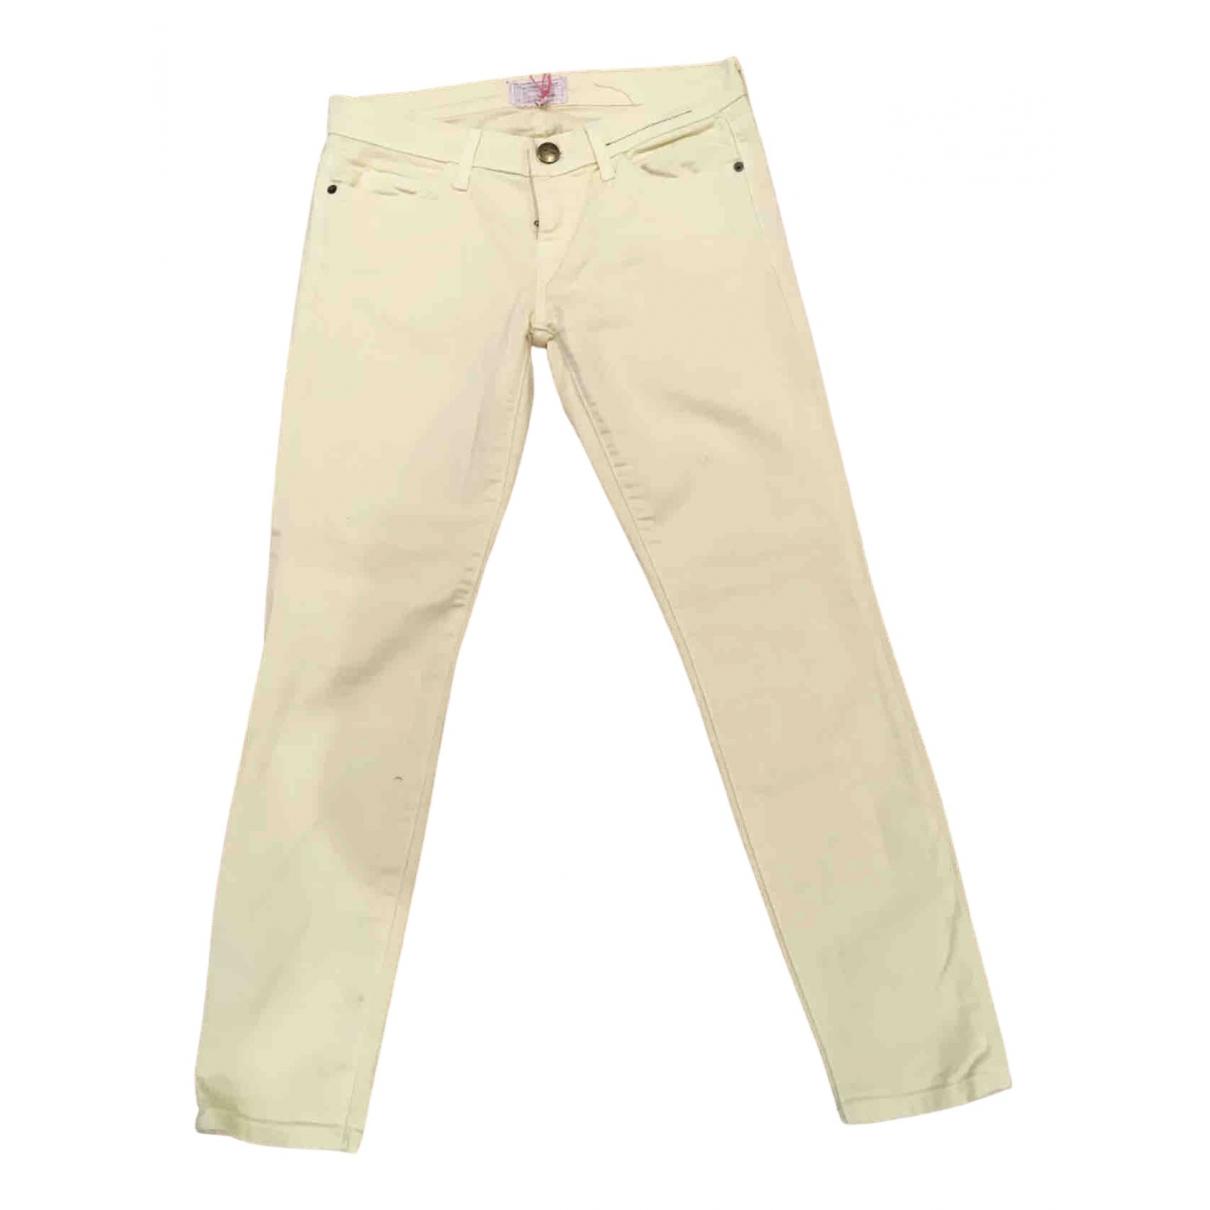 Current Elliott \N Yellow Denim - Jeans Jeans for Women 26 US